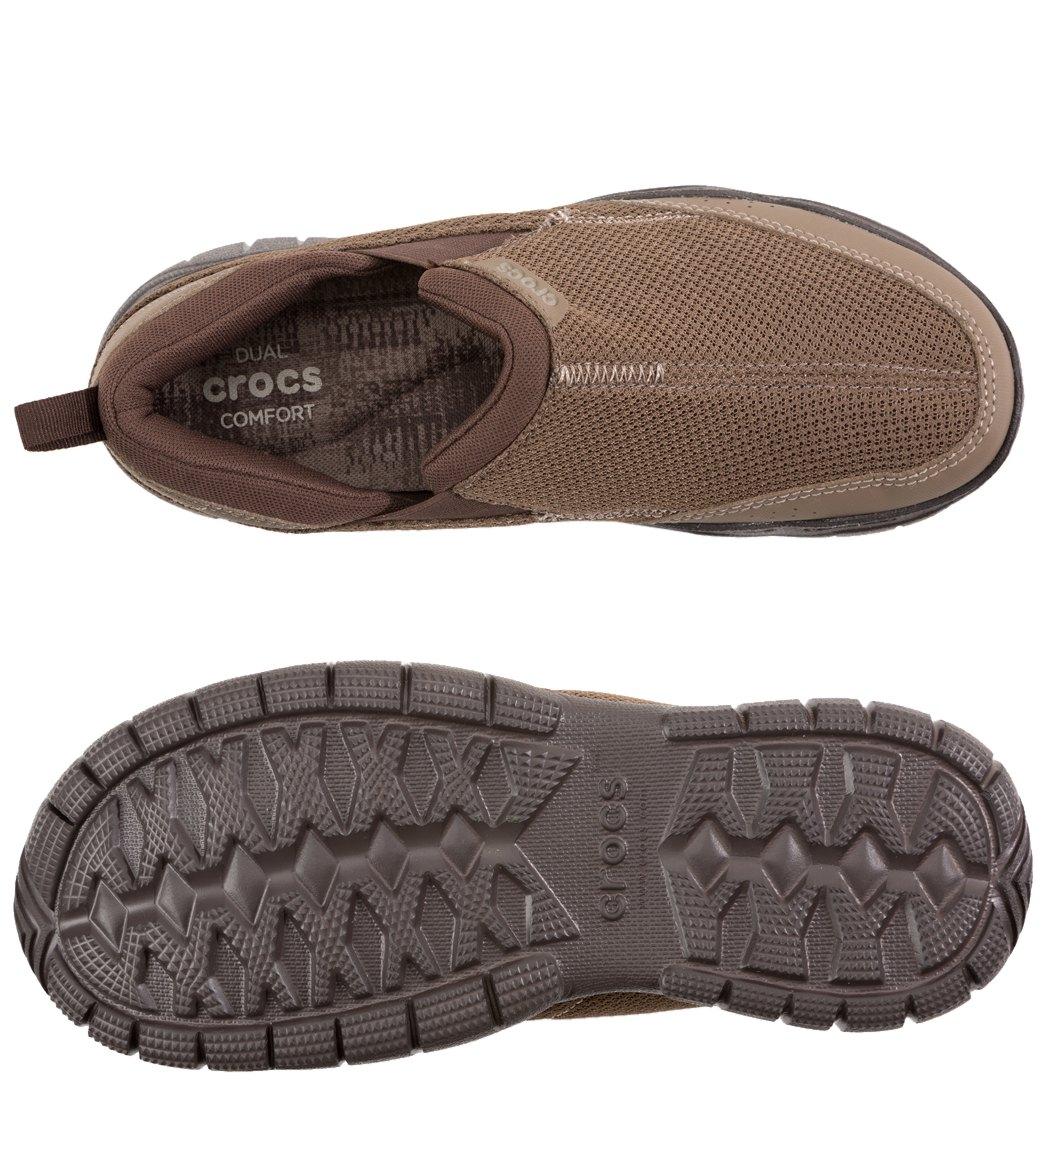 4669e48baeec Crocs Men s Swiftwater Mesh Moc Slip On at SwimOutlet.com - Free ...